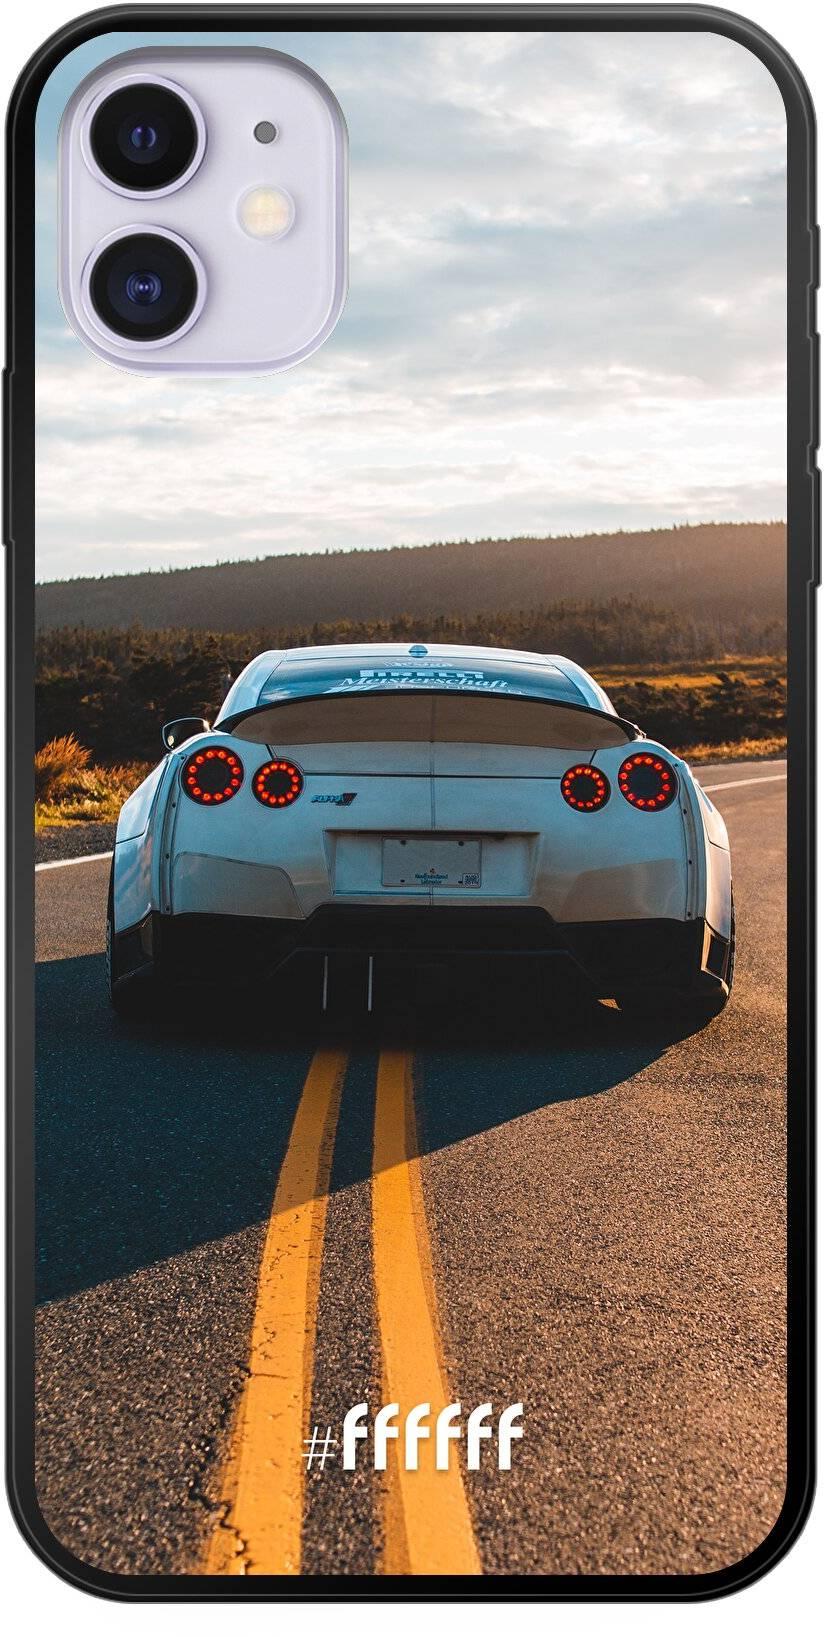 Silver Sports Car iPhone 11